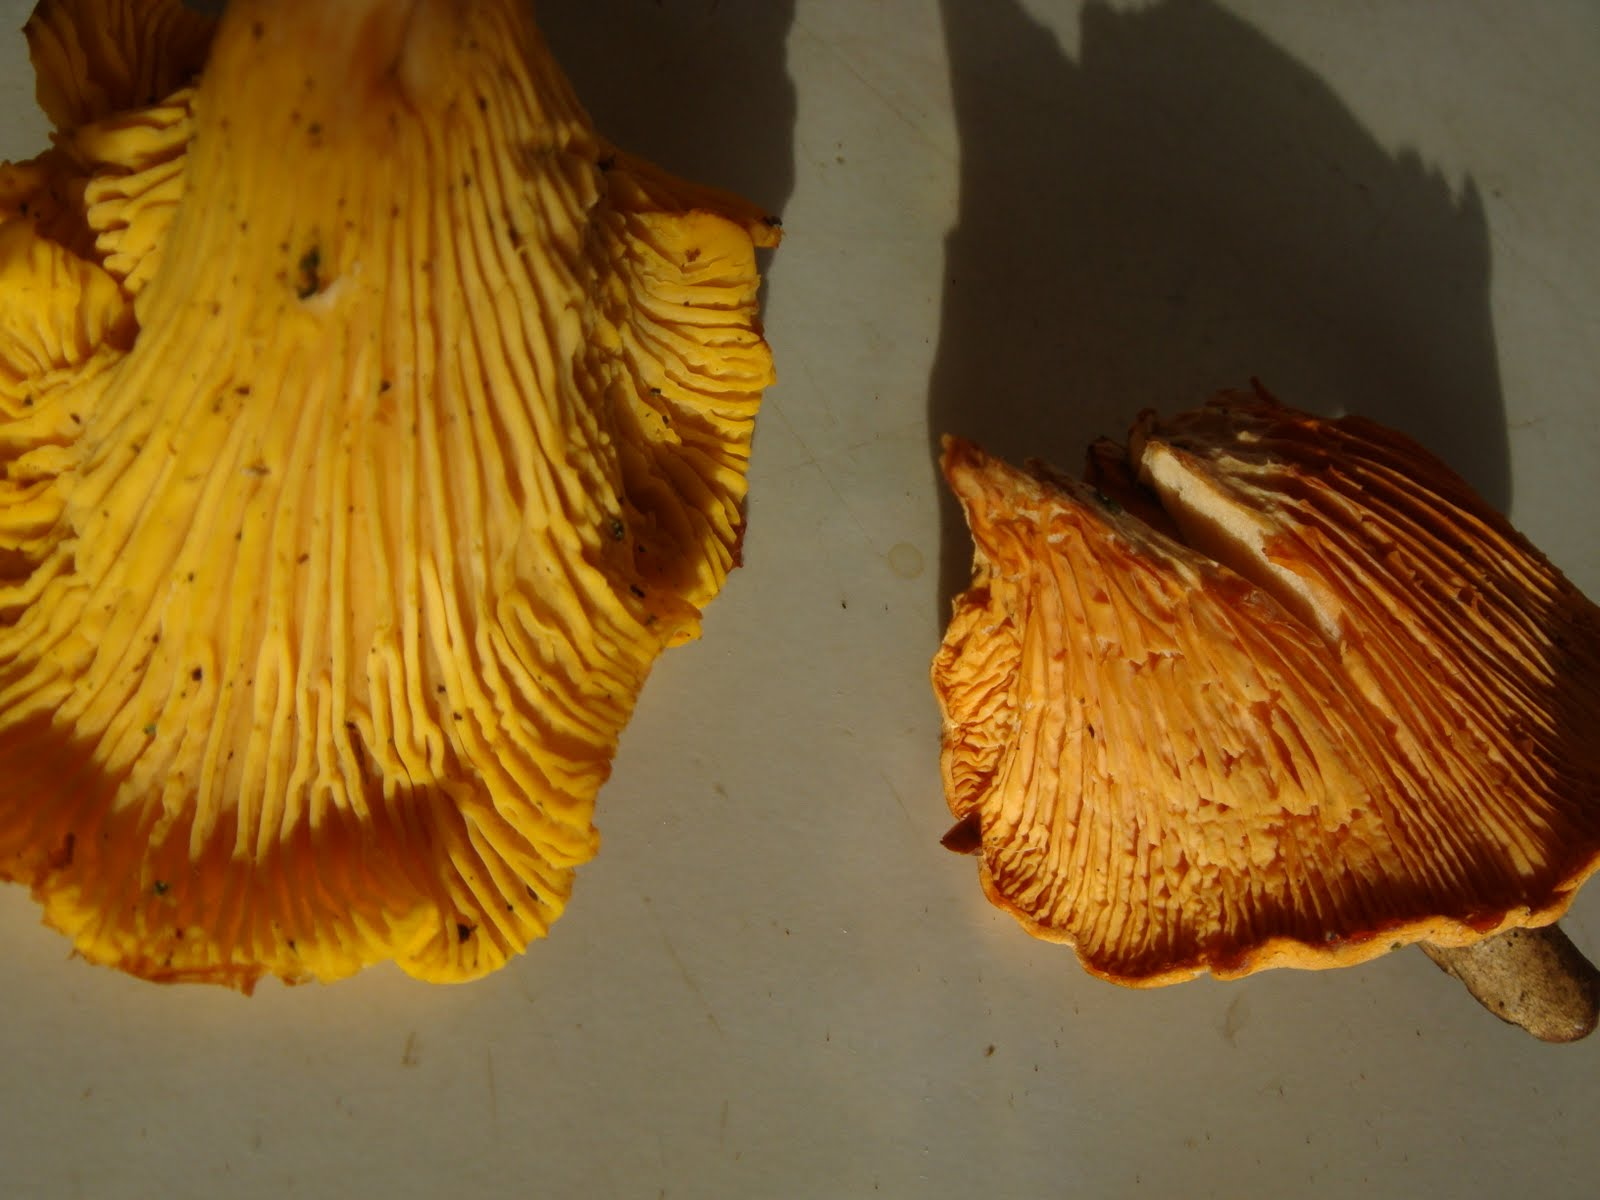 The Sunday Roaster Wild Mushroom Foraging How To Tell